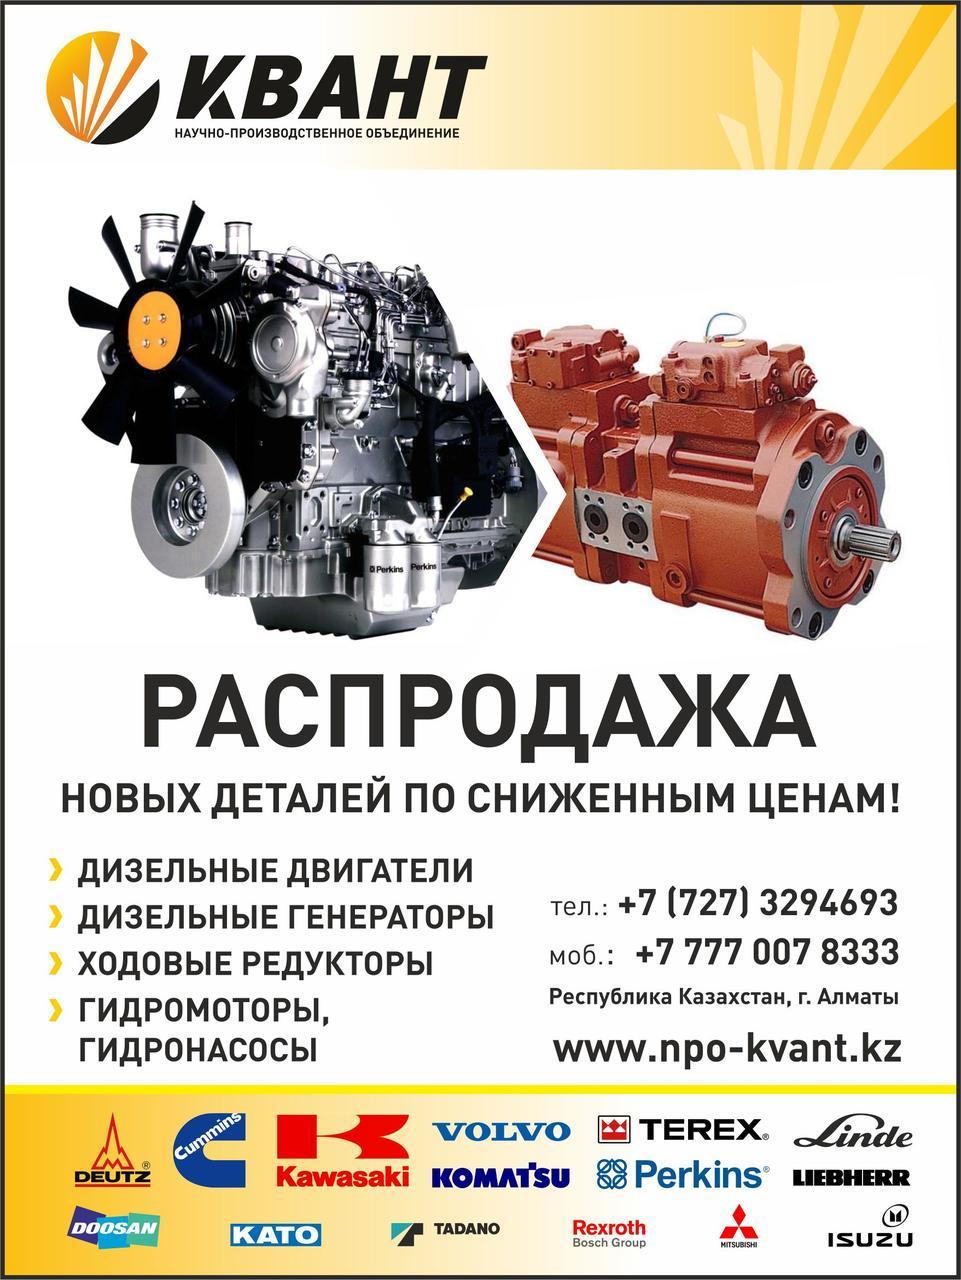 Двигатель MTU 20V4000G68L, MTU 20V4000G83, MTU 16V4000G83, MTU 16V4000G43, MTU 12V4000G83